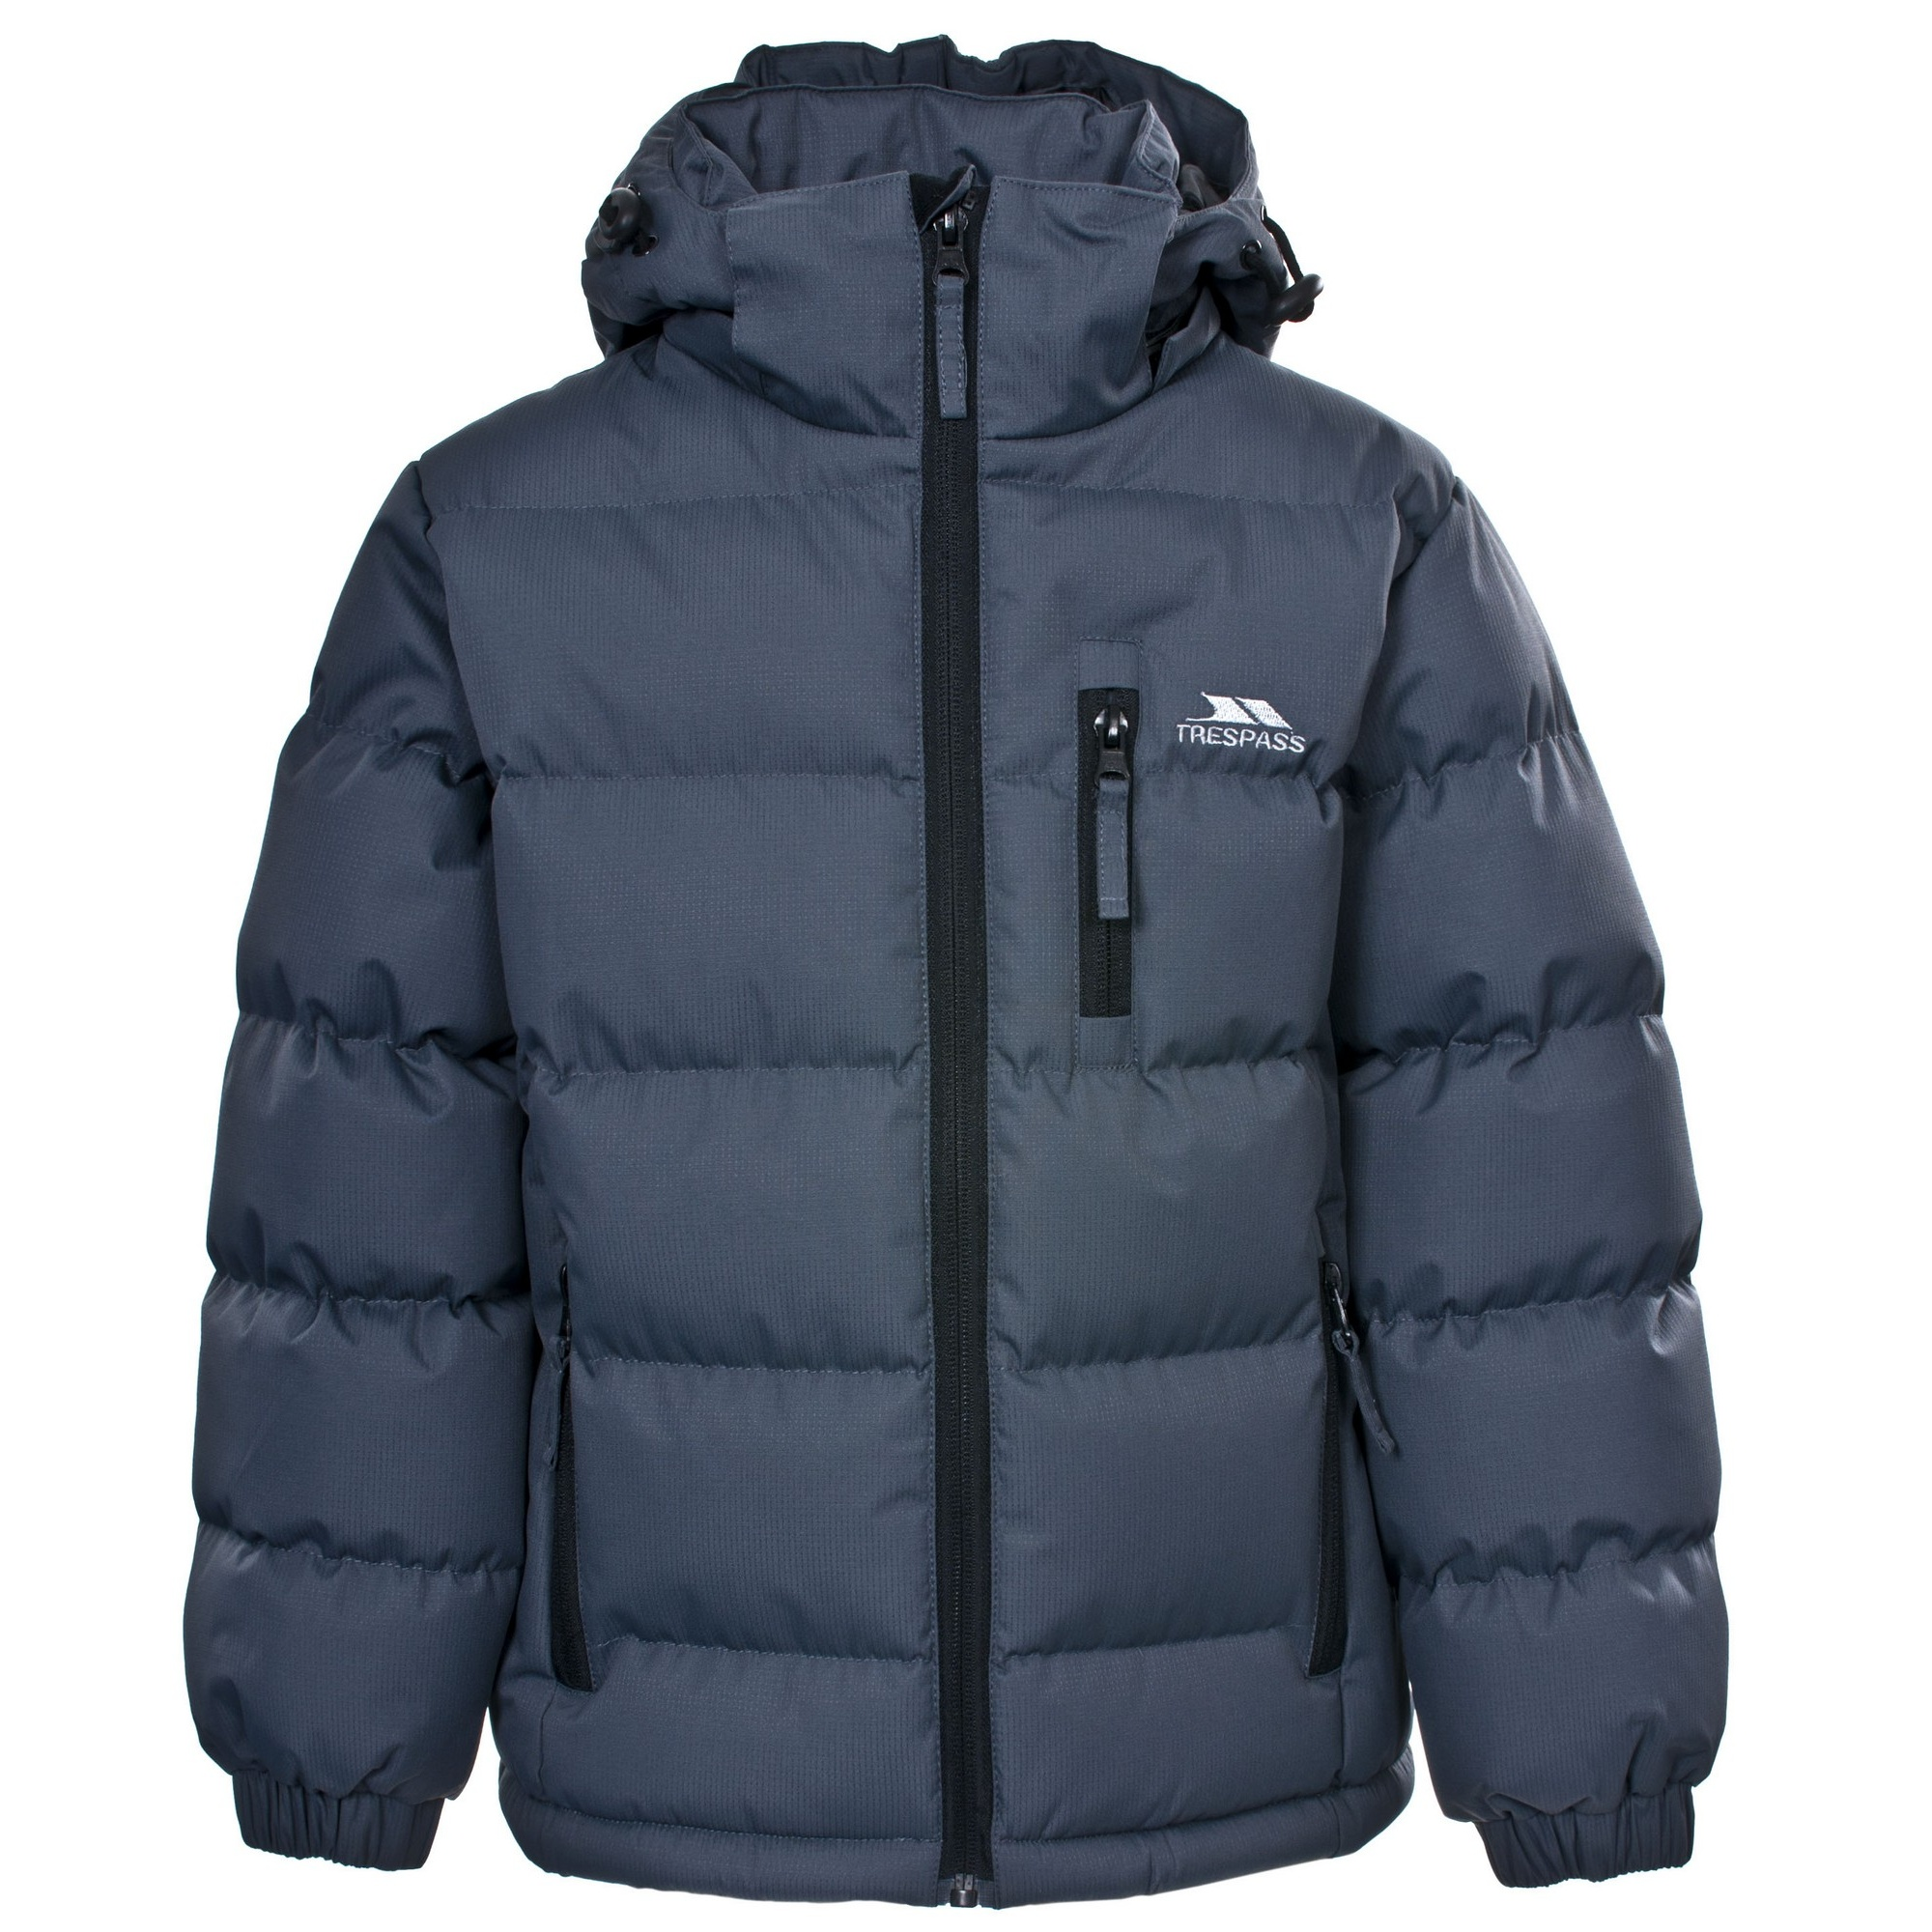 Trespass Kids Boys Tuff Padded Winter Jacket | EBay